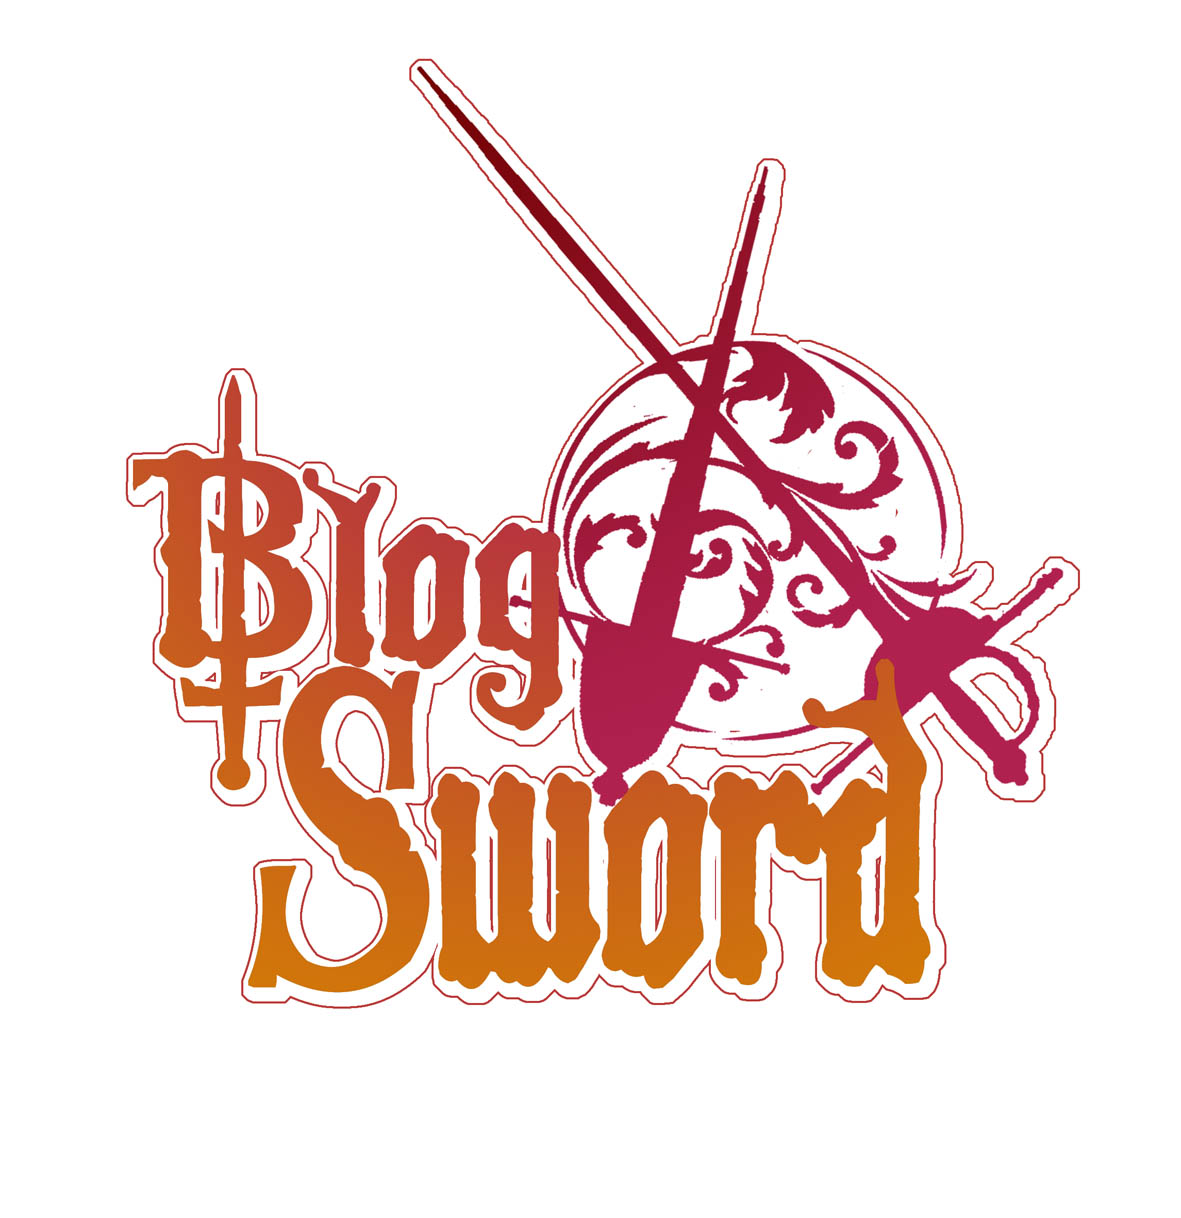 Blog Sword